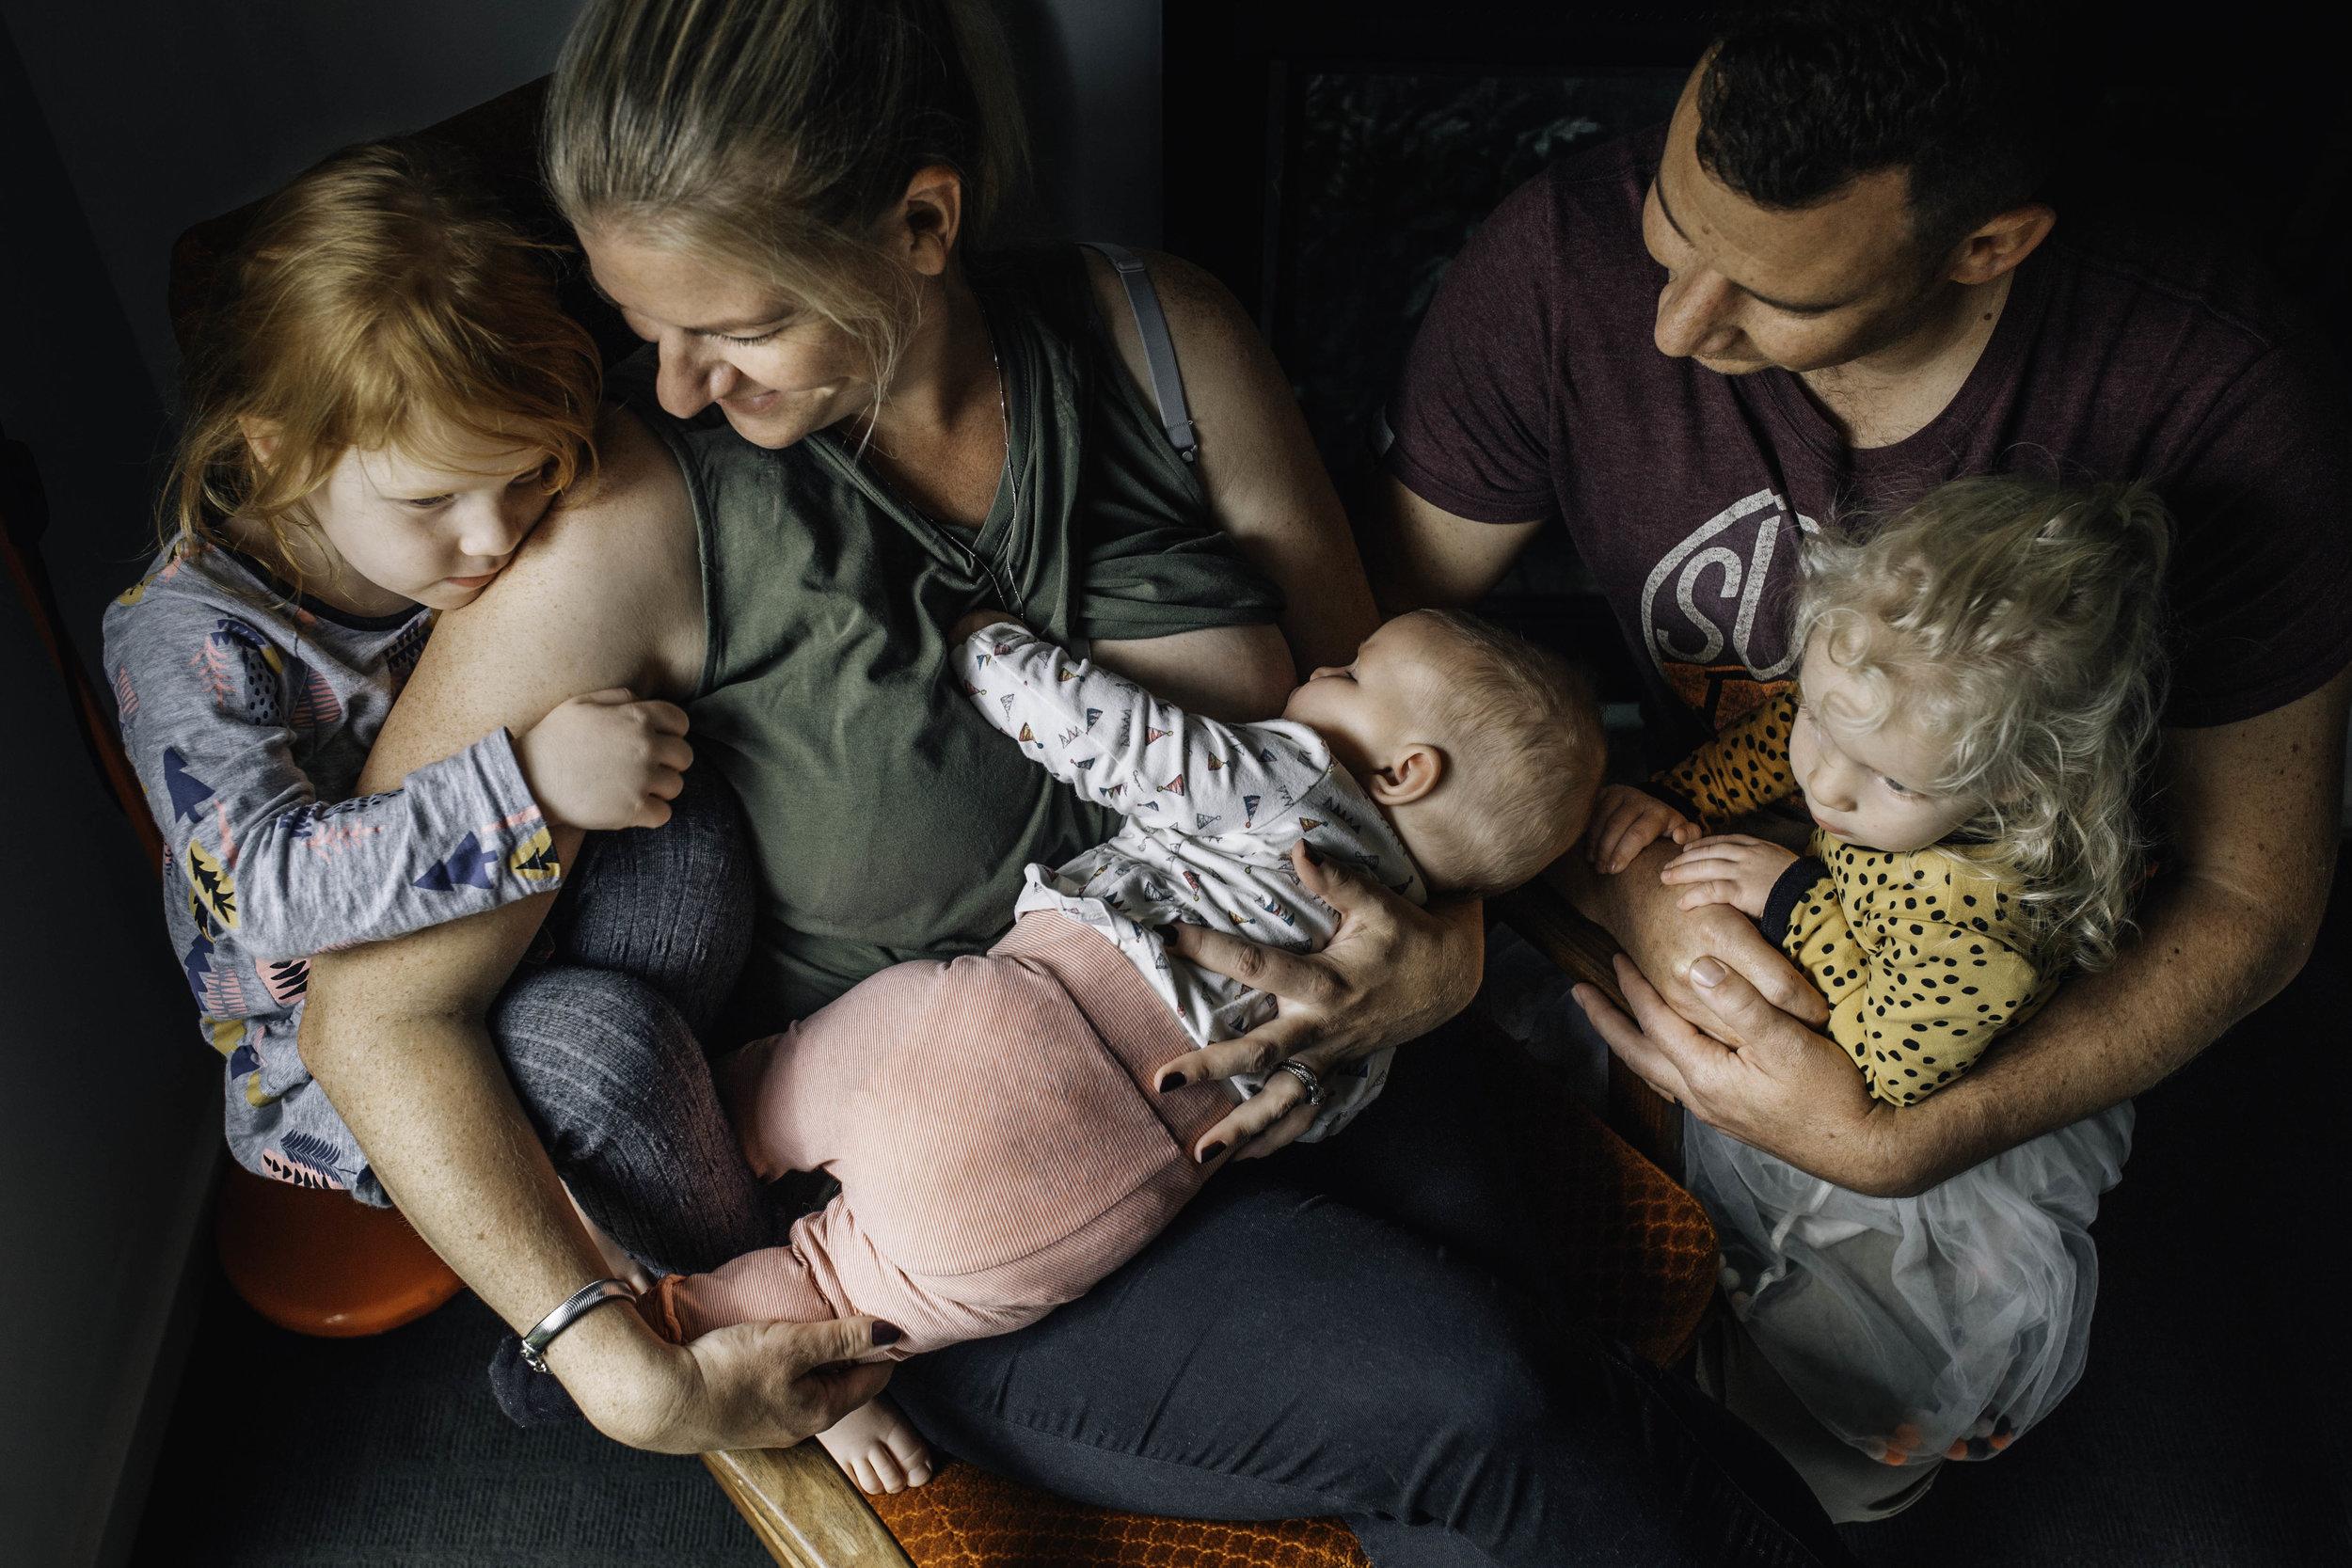 family-portrait-while-feeding-baby.jpg